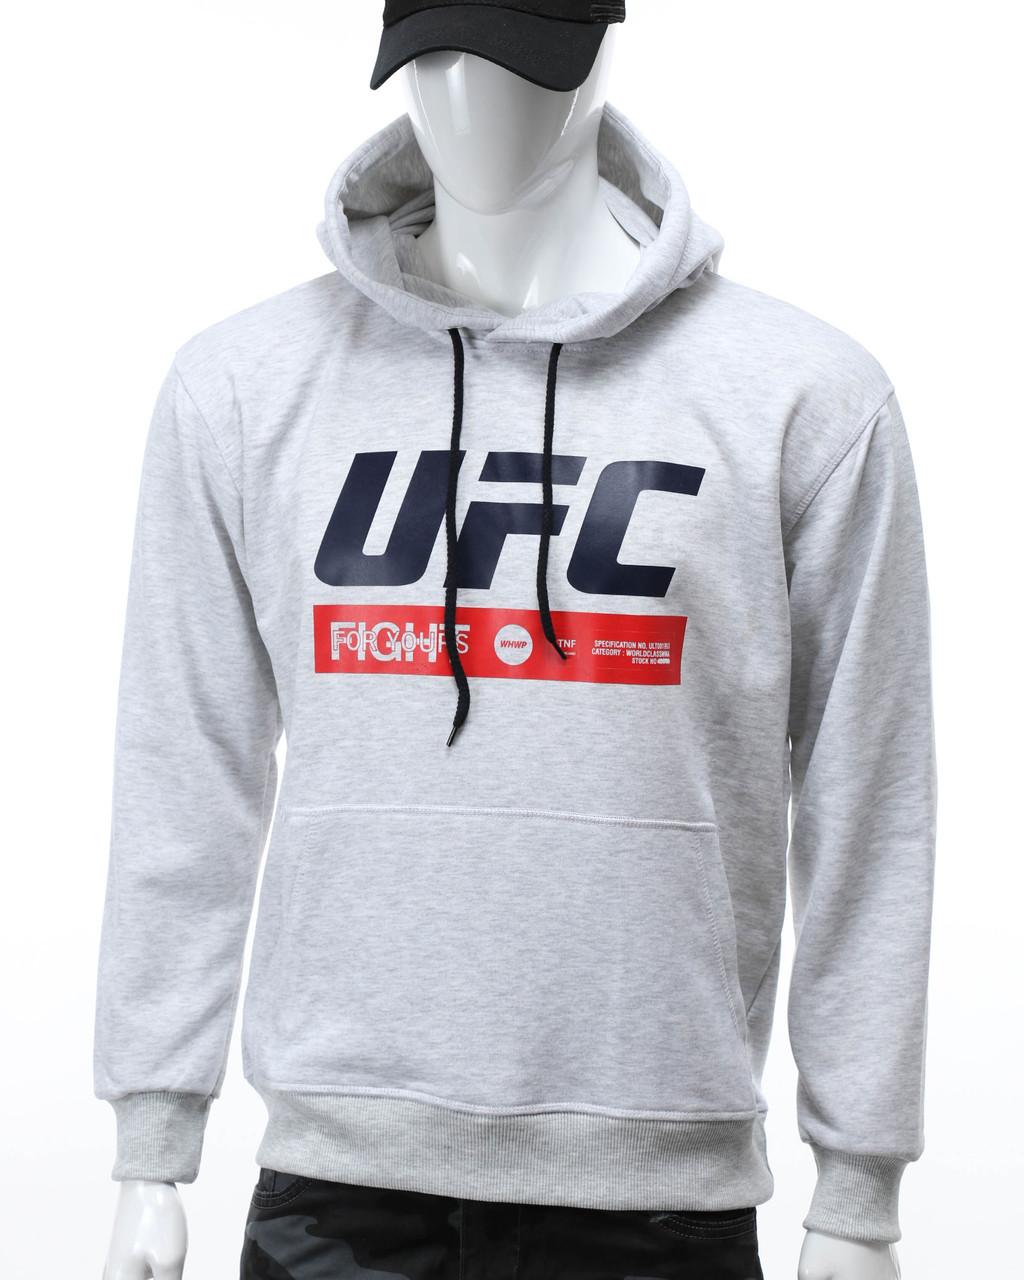 "Худи бел меланж UFC ""FIGHT"" с лого Т-2 WTGRI L(Р) 20-471-201"